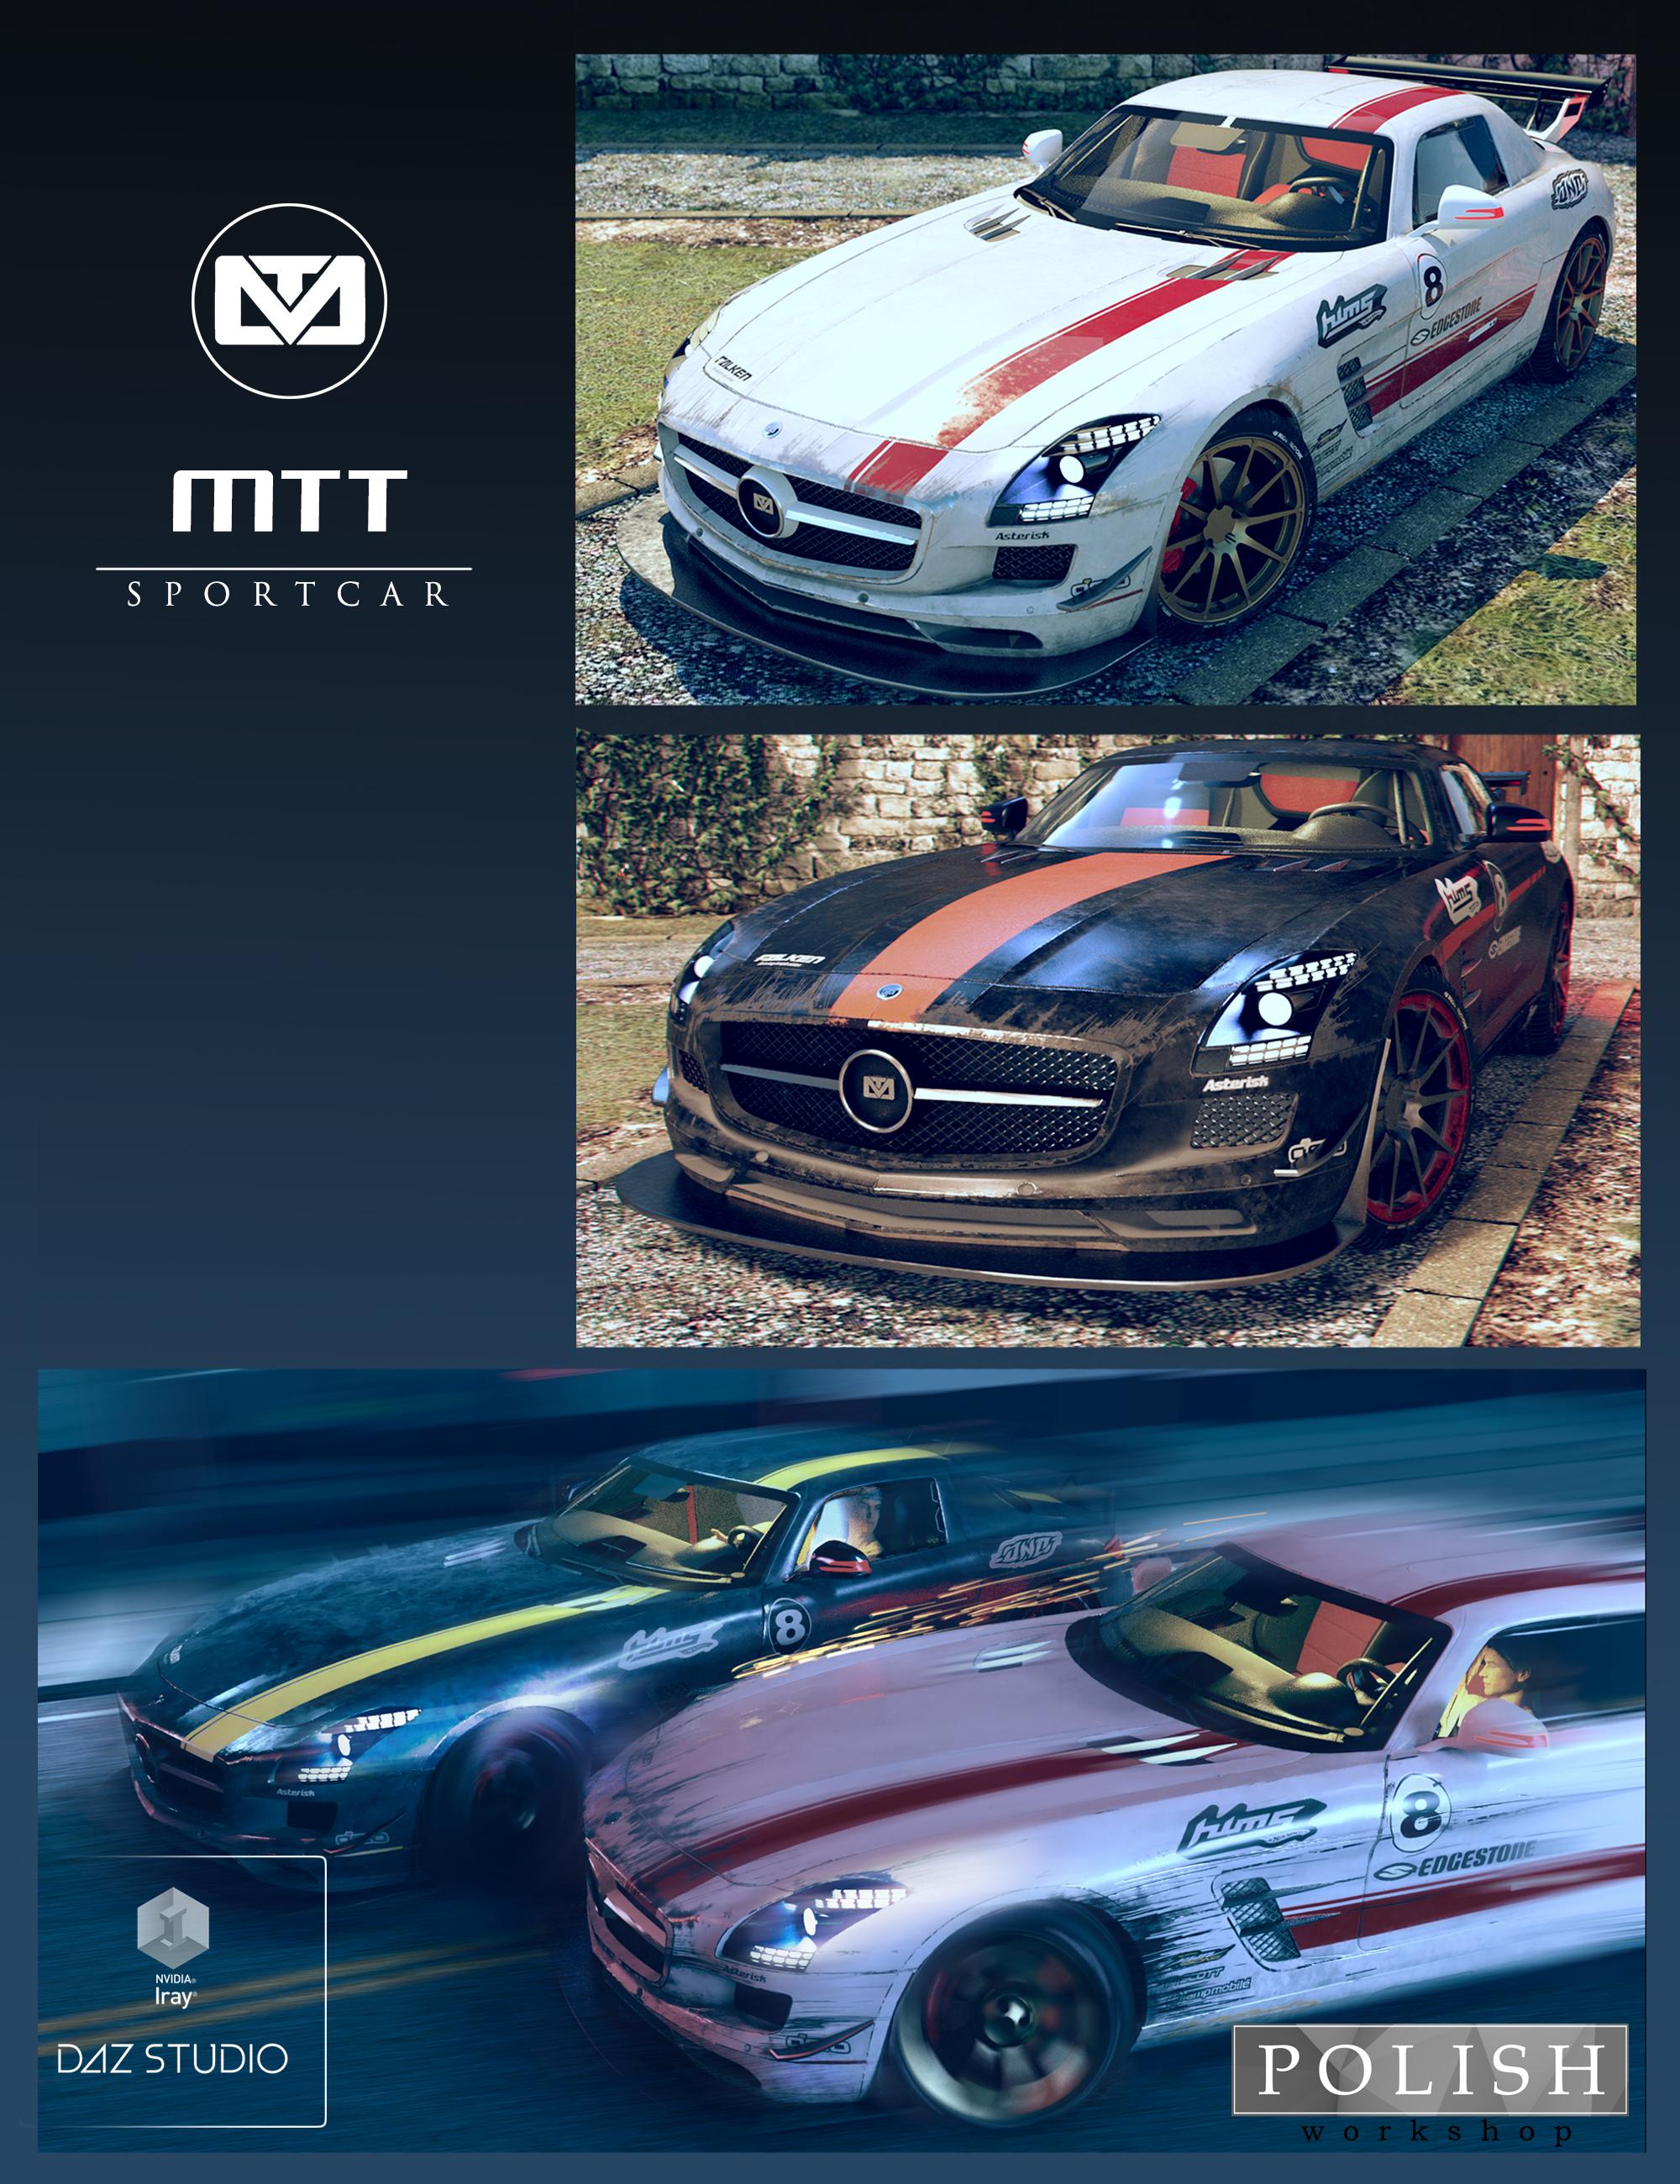 MTT Sportcar by: Polish, 3D Models by Daz 3D